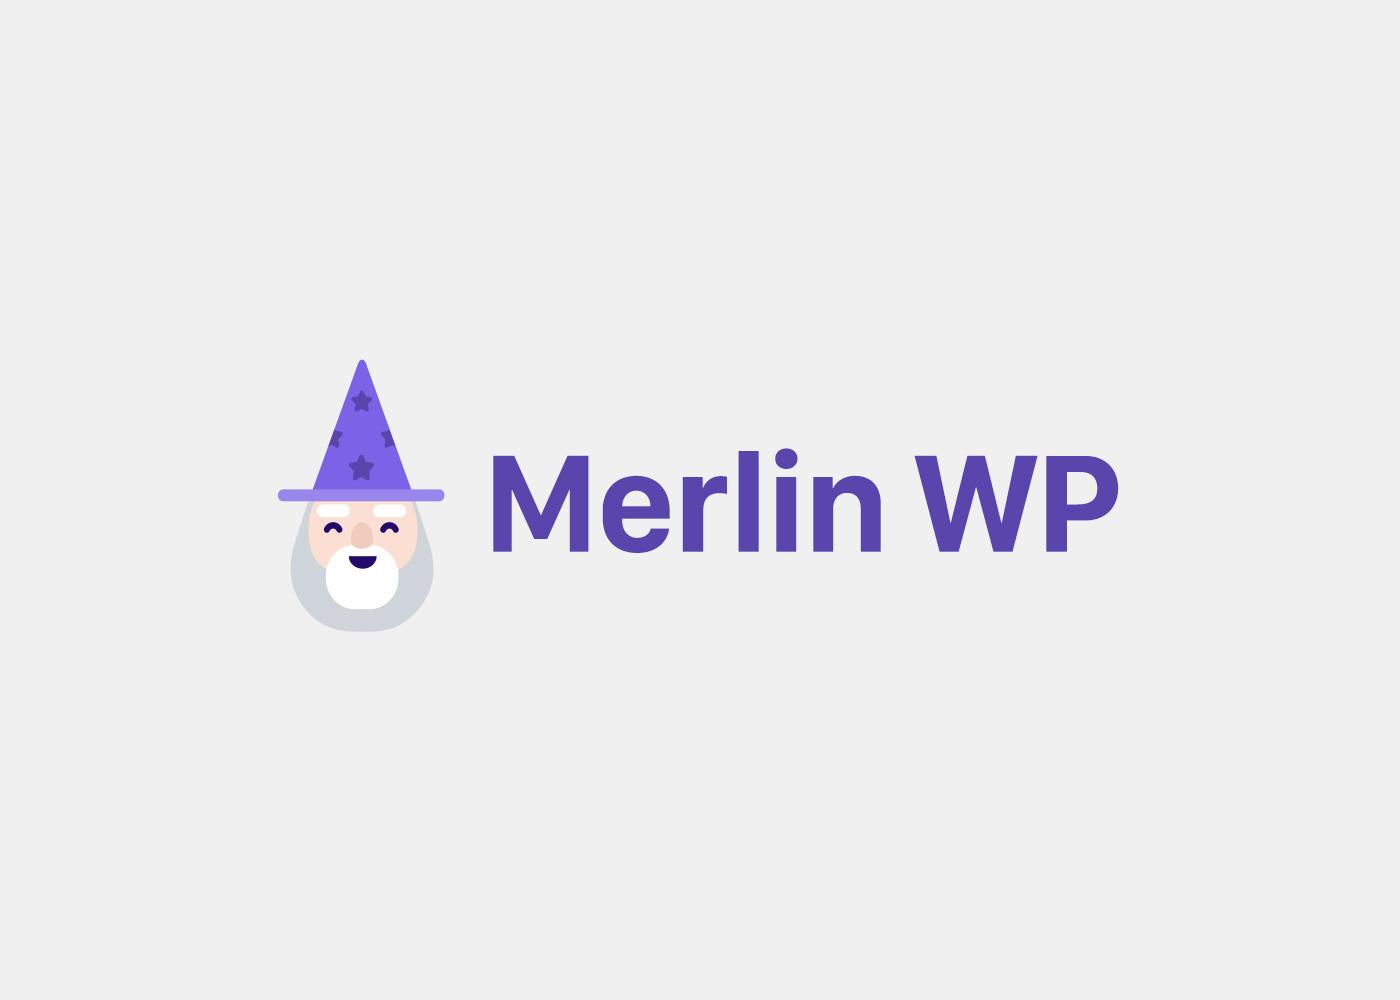 Better WordPress Theme Onboarding with Merlin WP